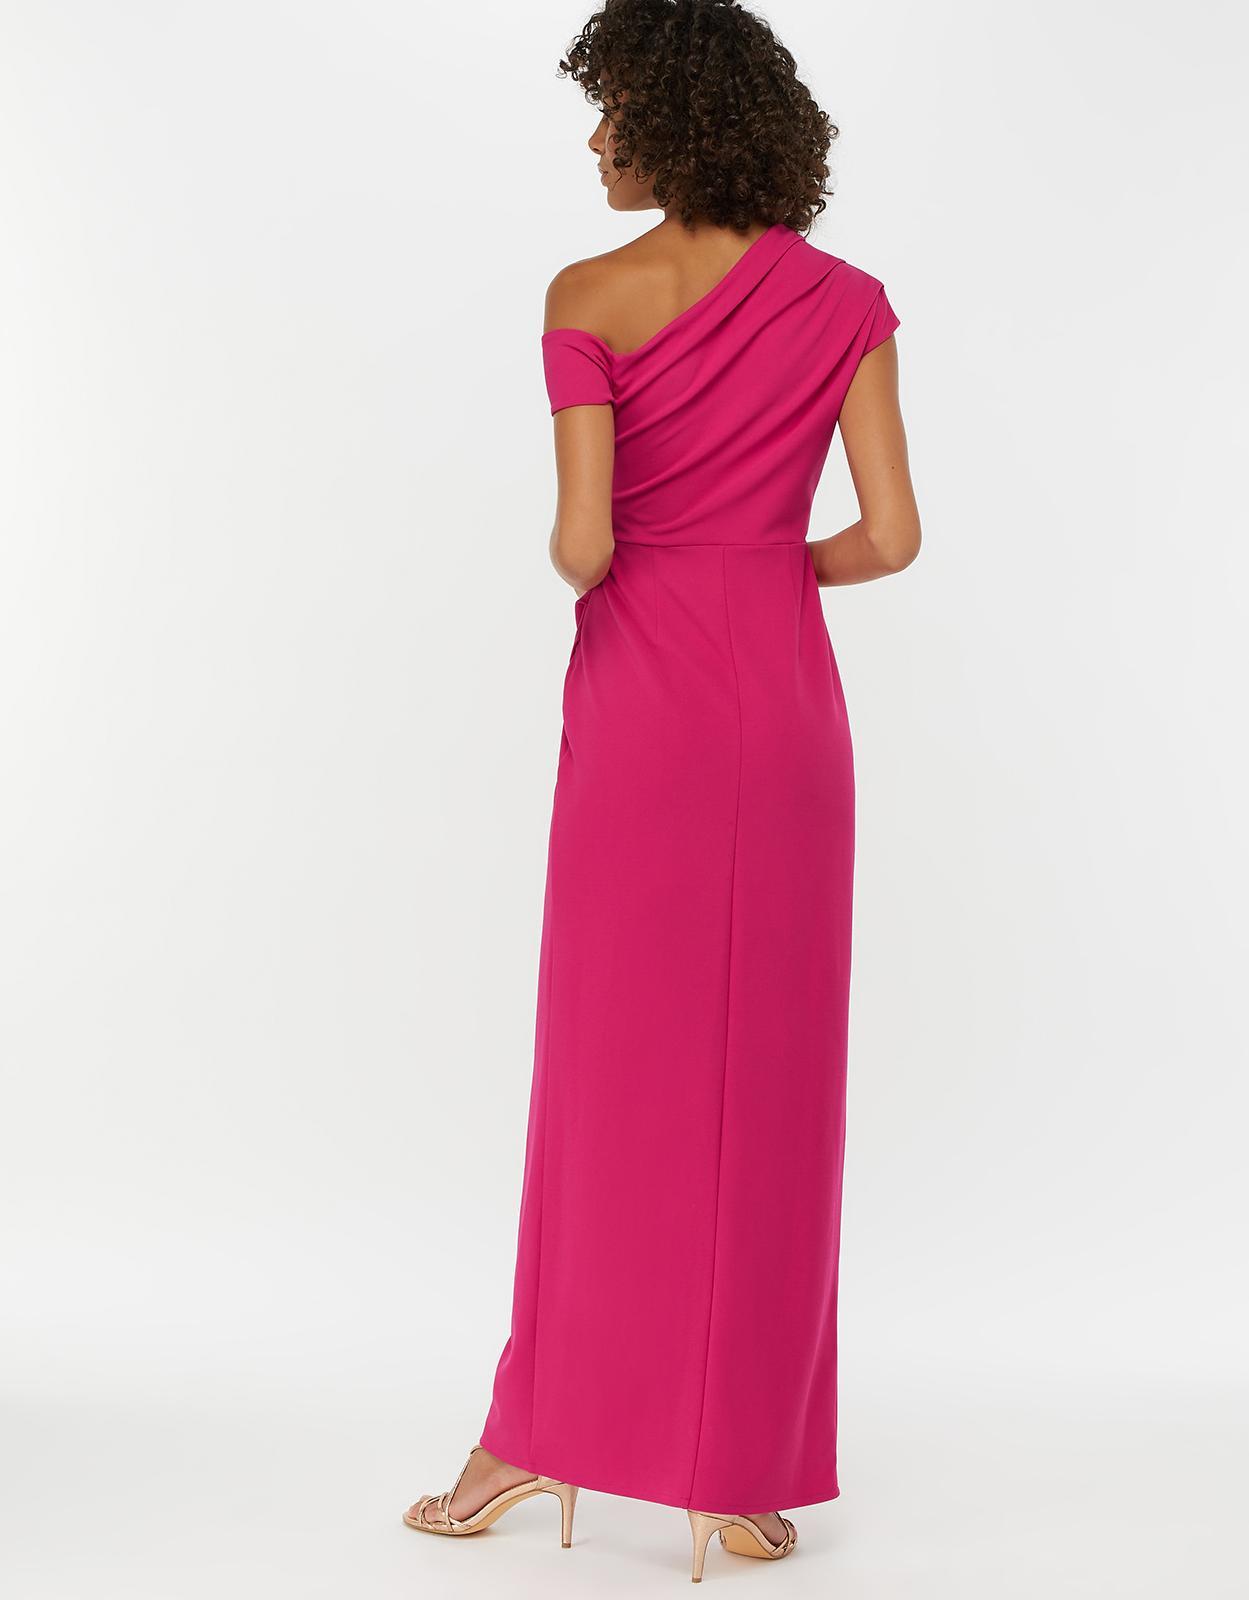 77c7a8f4 Monsoon Senorita Drape Detail Maxi Dress in Pink - Save 28% - Lyst